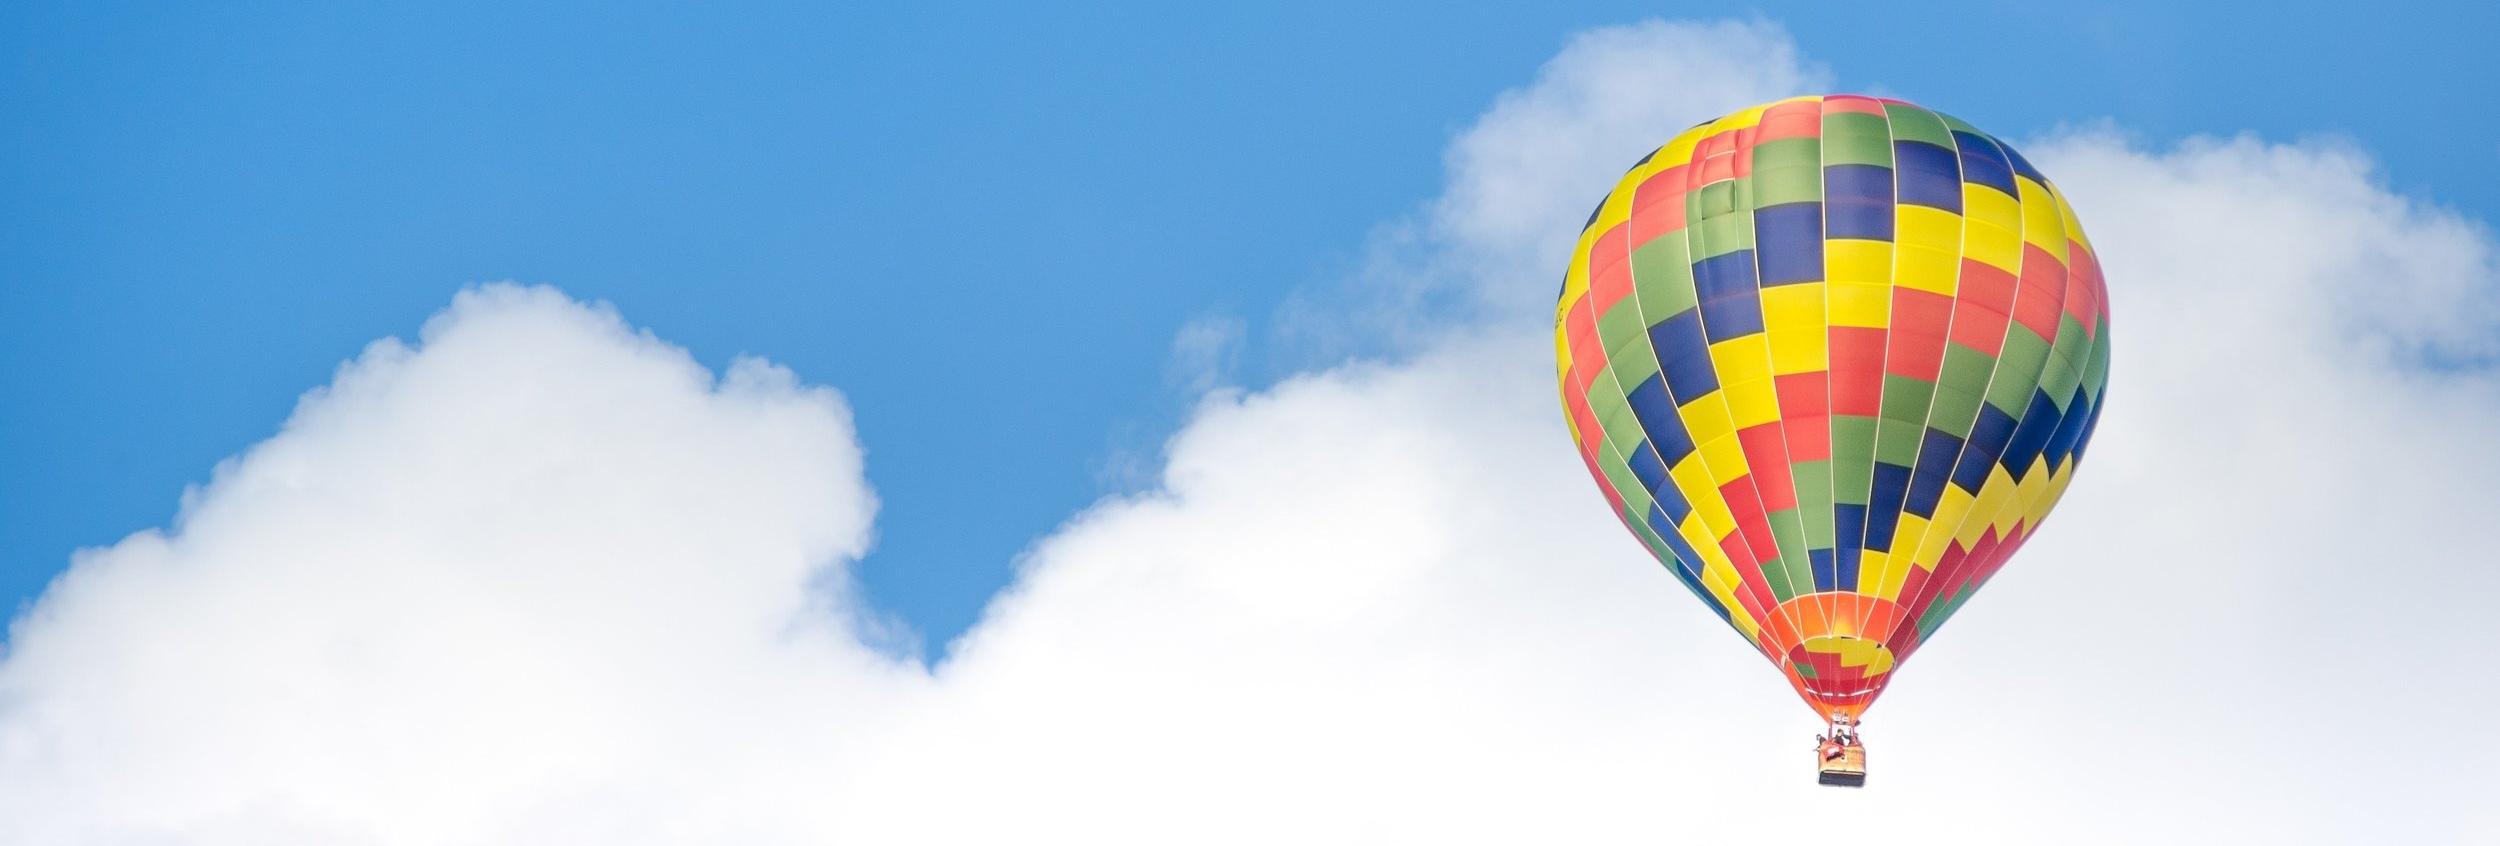 adventure-balloon-clouds-68806.jpg